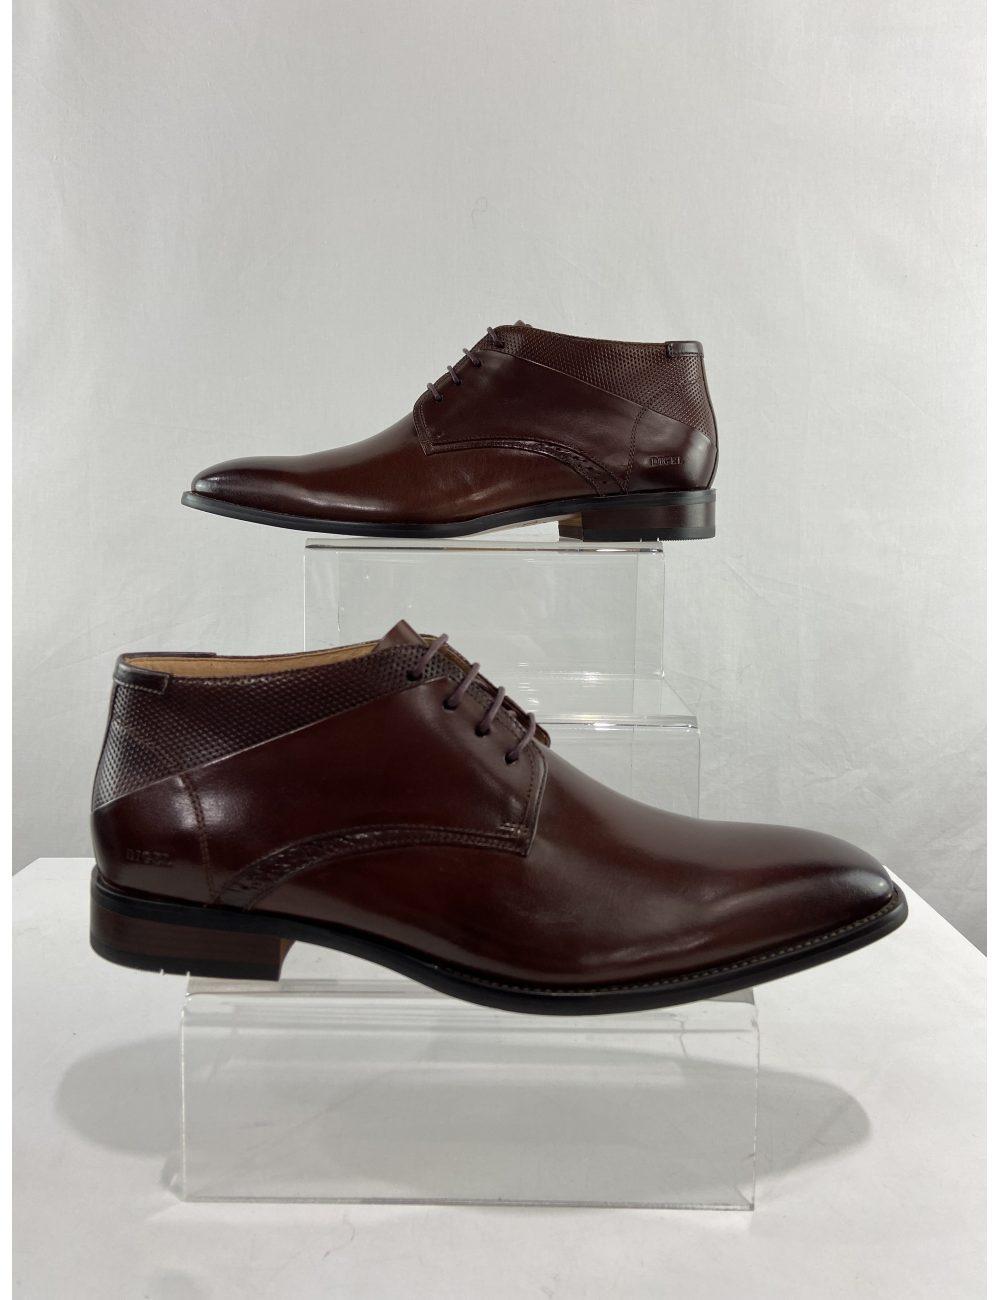 Chaussure Stephen 1906